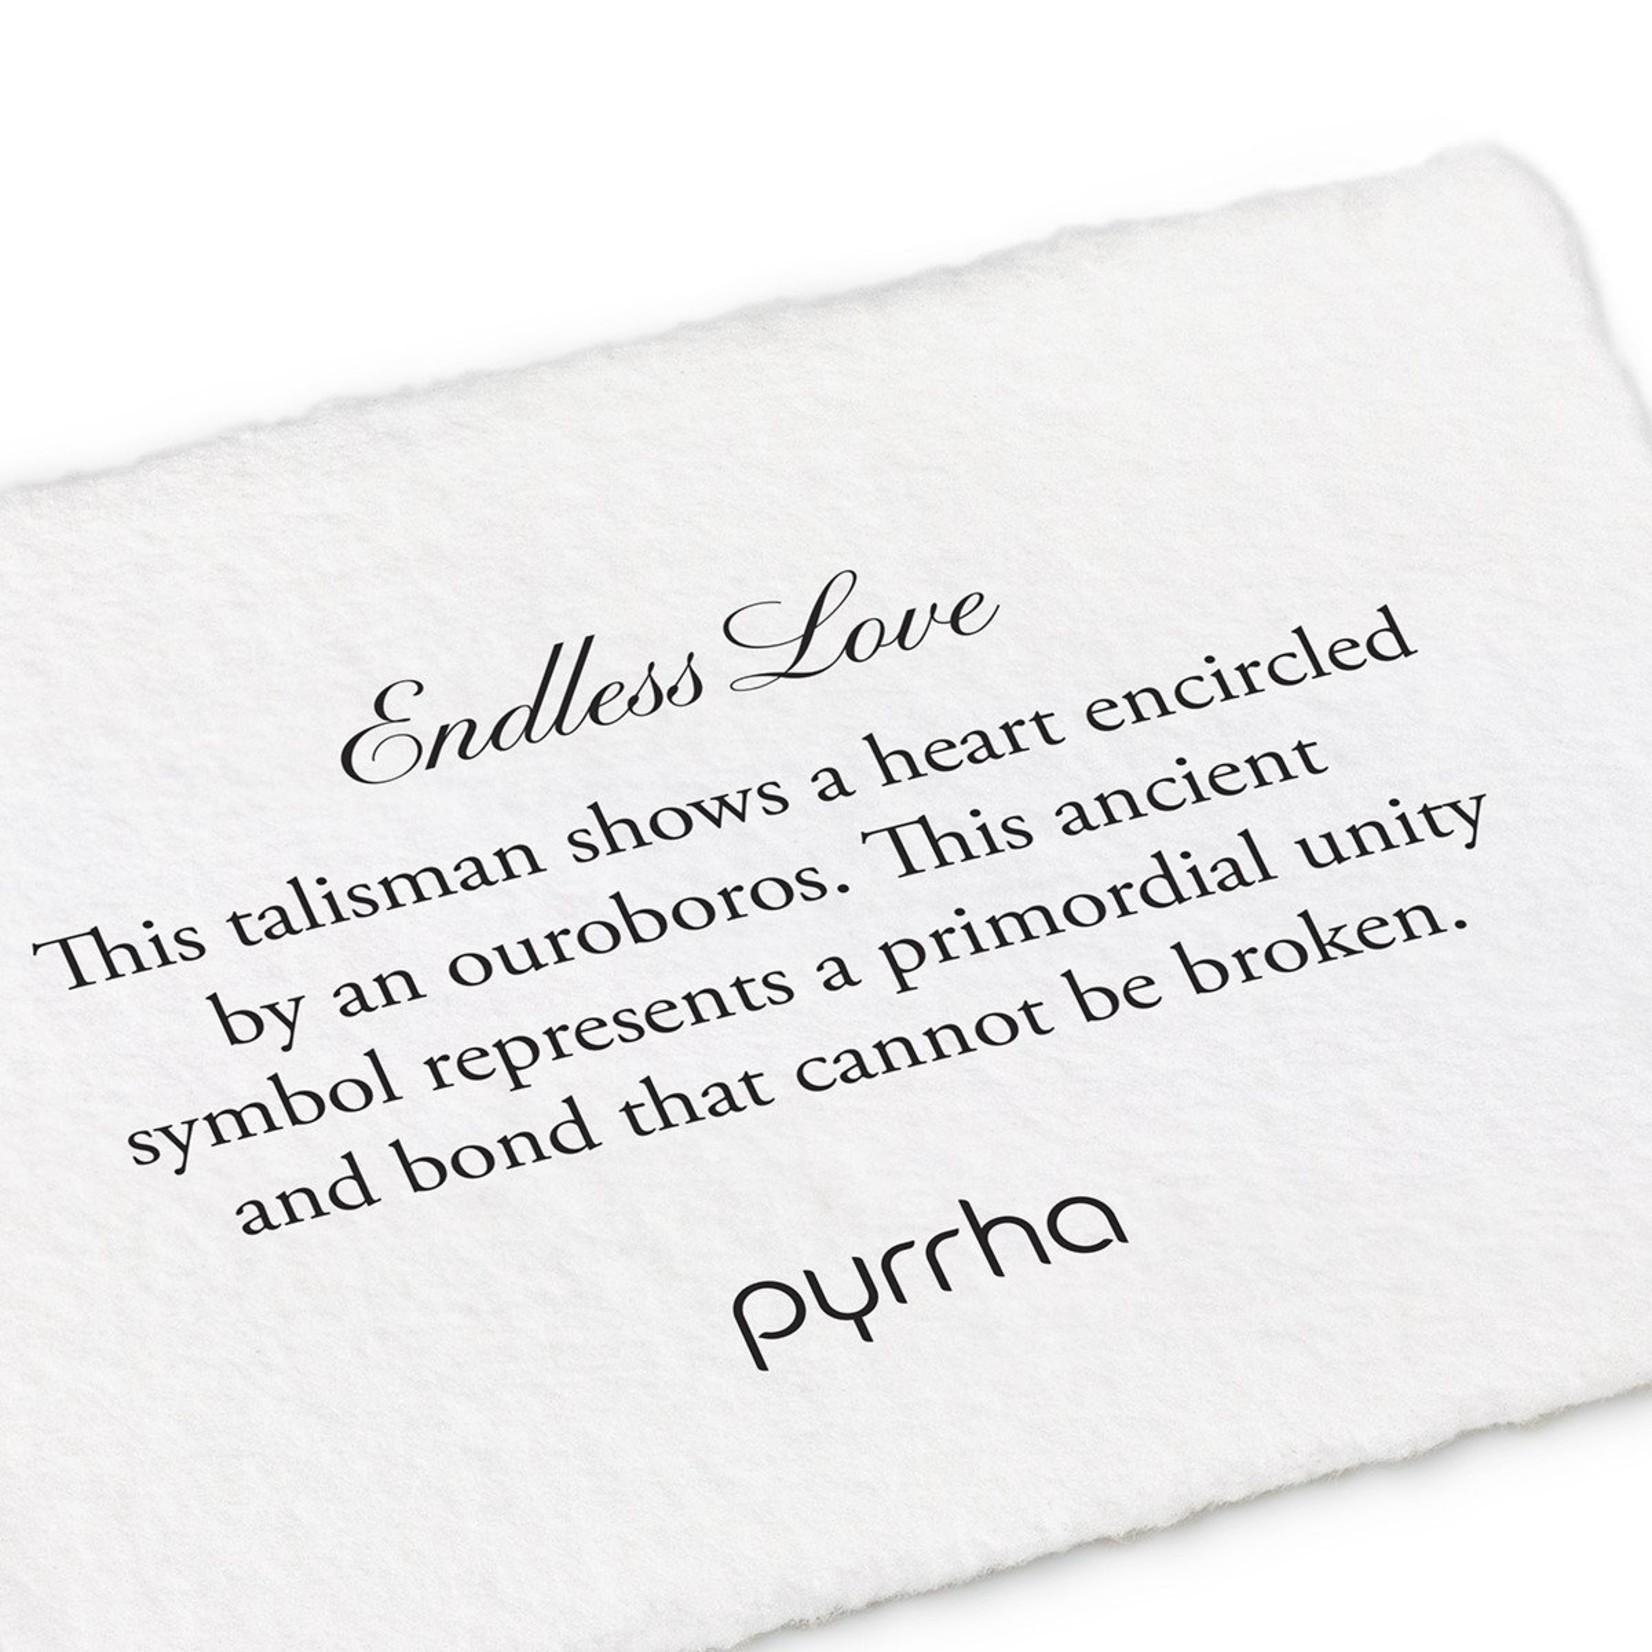 Pyrrha Endless Love Signature Talisman